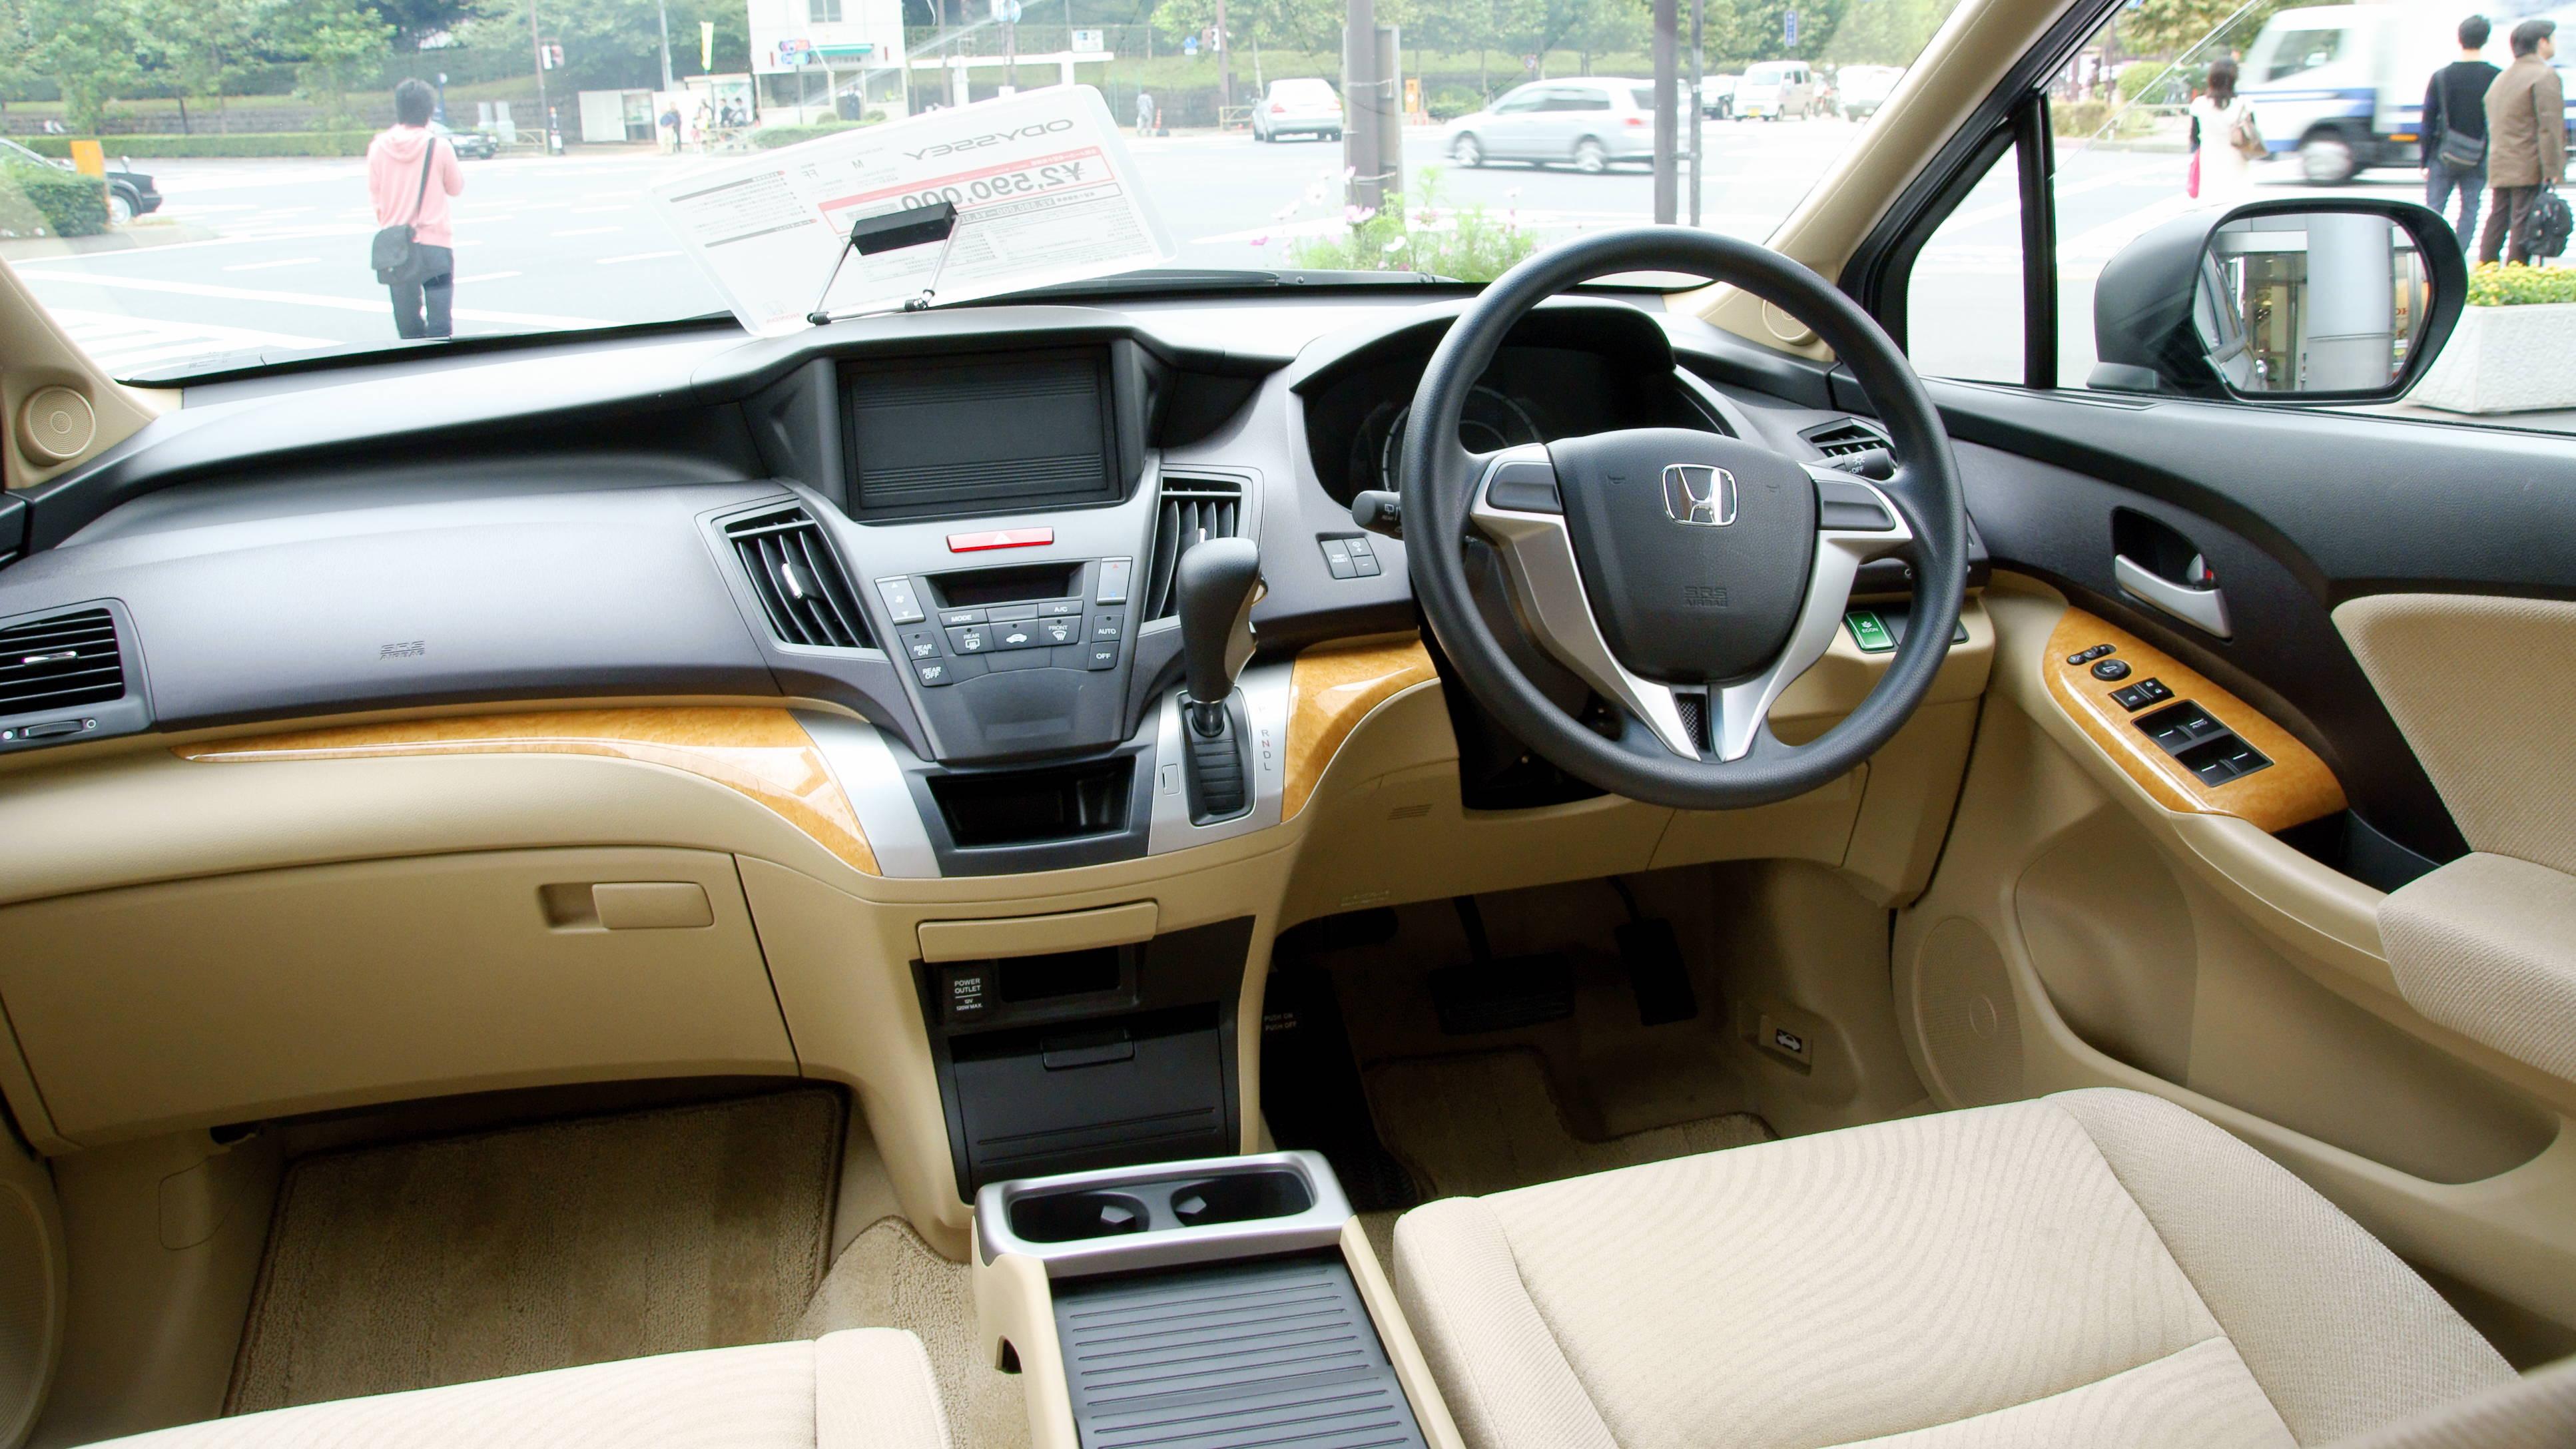 Berkas2008 Honda Odyssey 05JPG Wikipedia Bahasa Indonesia